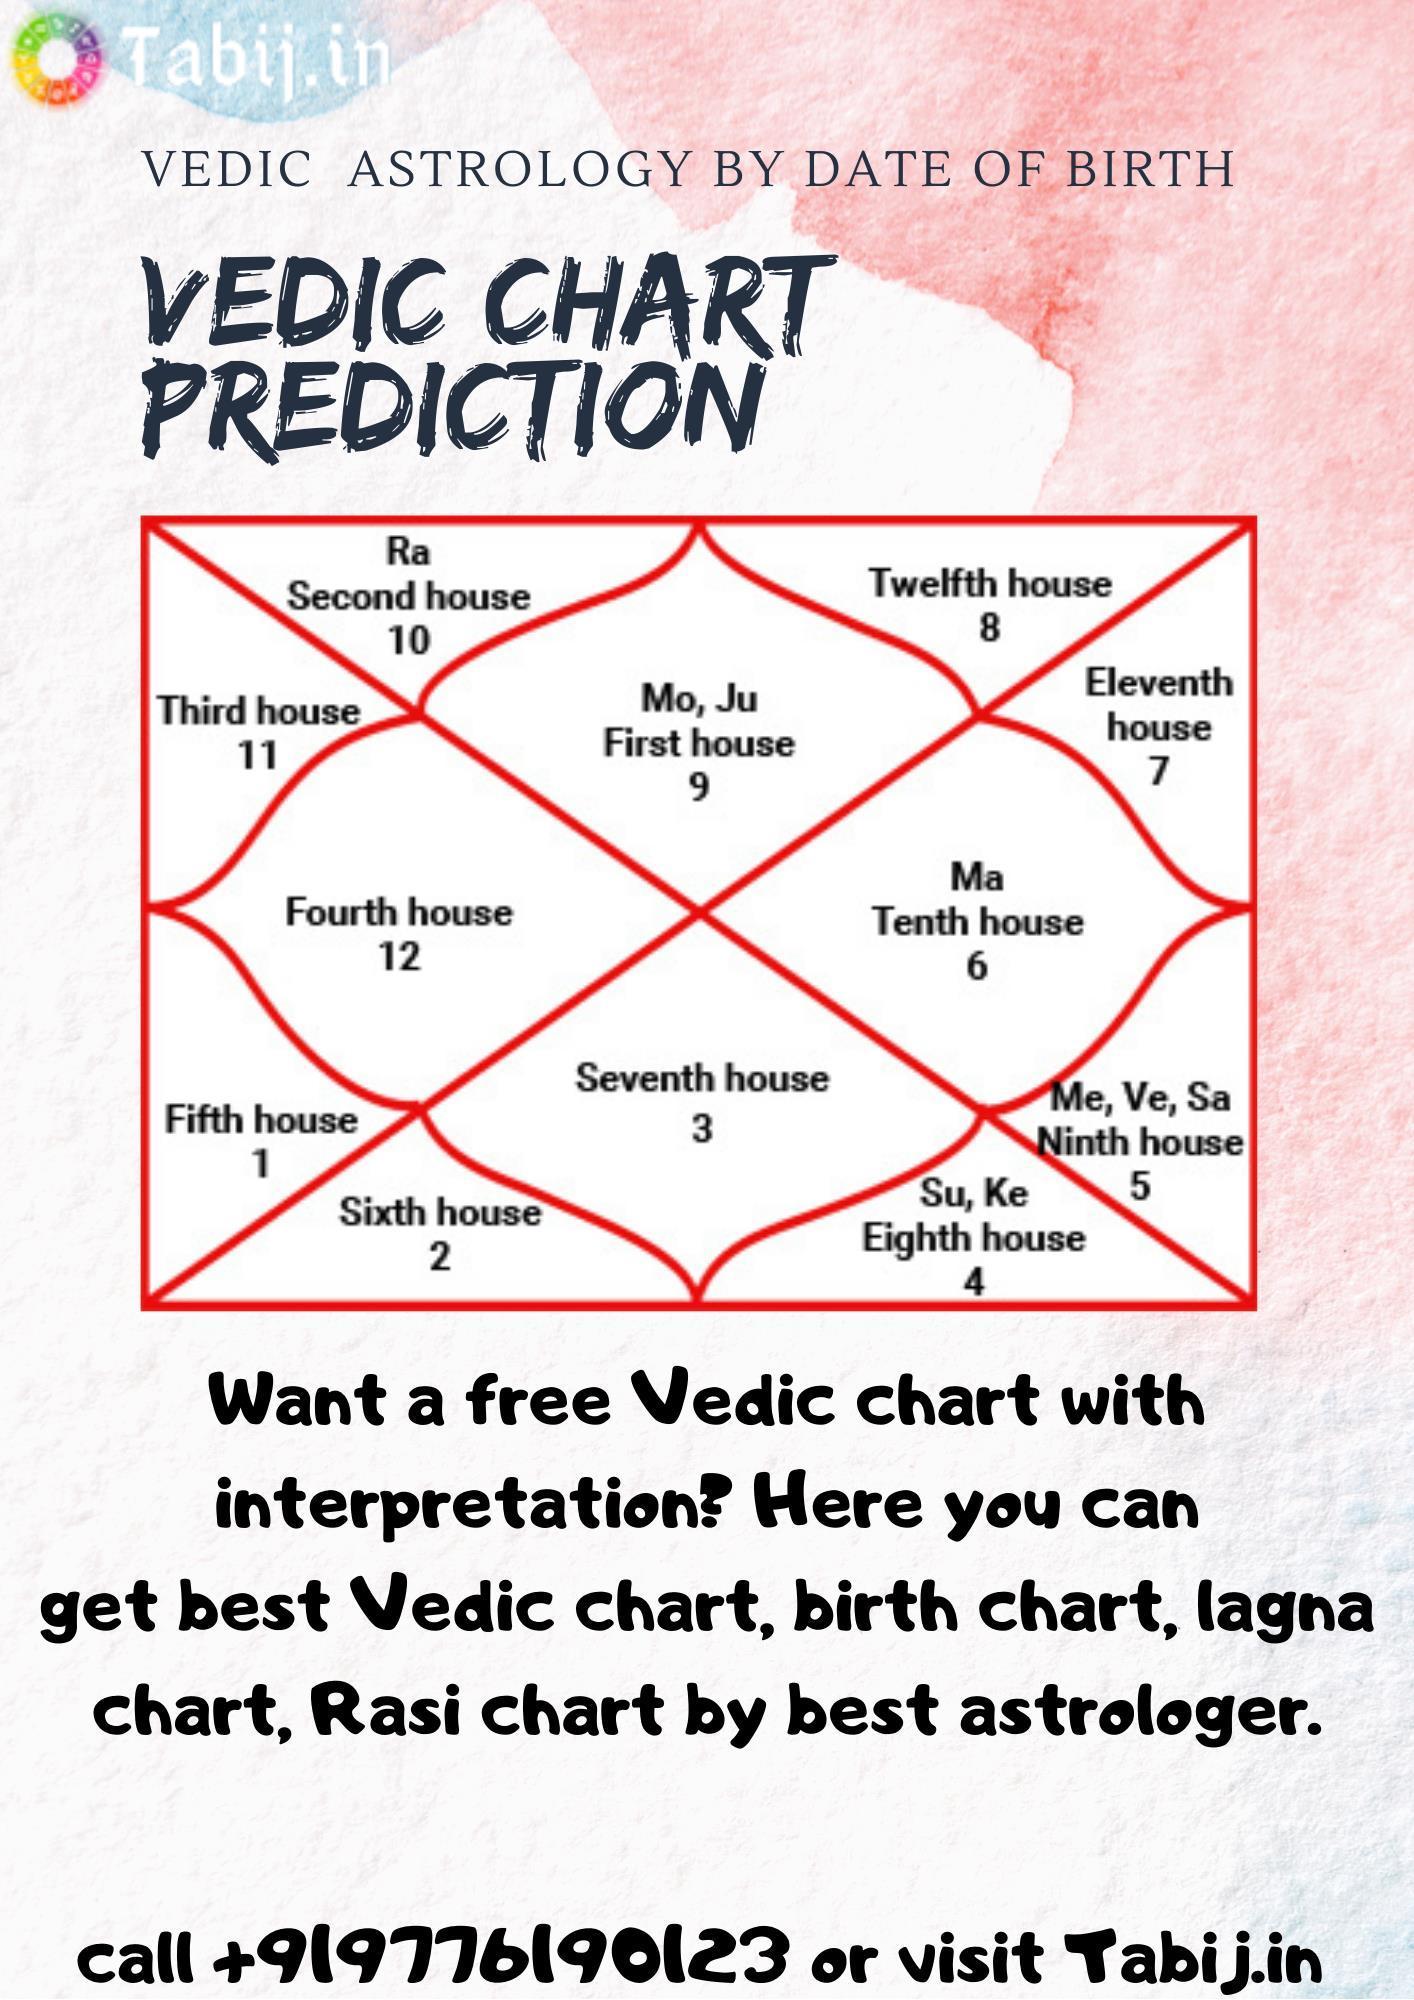 Vedic astrology prediction: Free Vedic chart, lagna chart